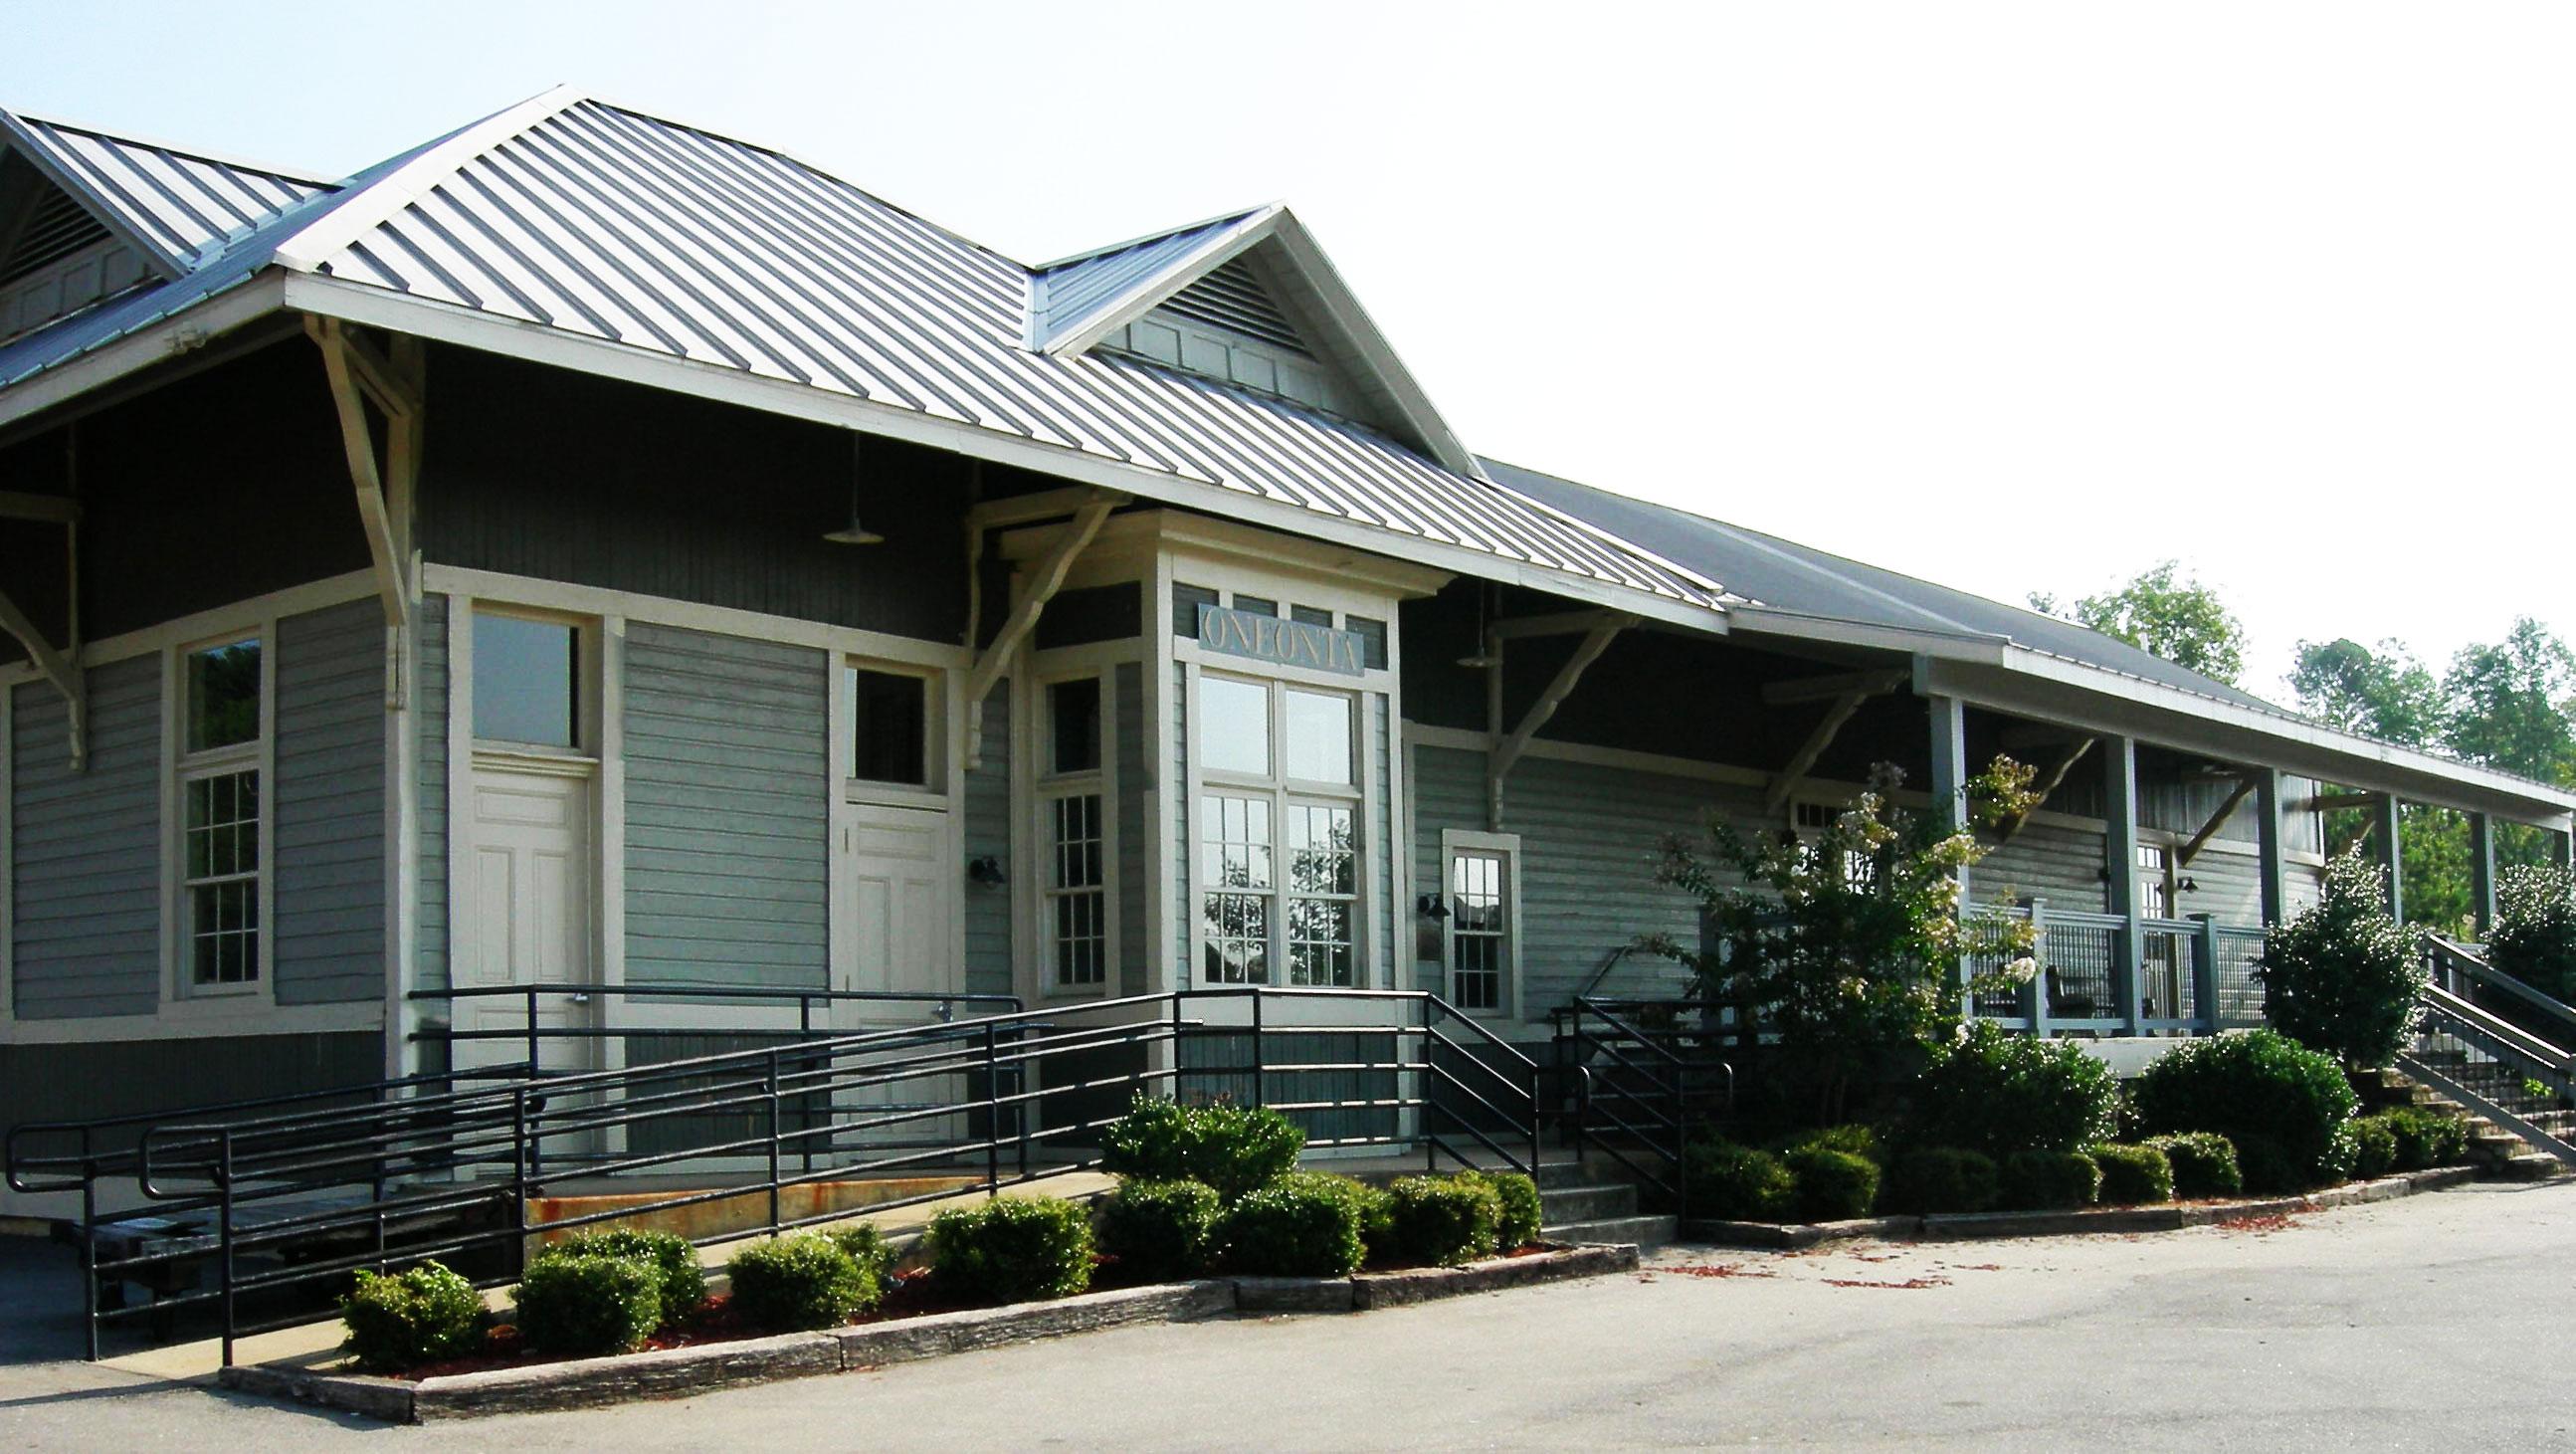 Historic Oneonta Train Depot